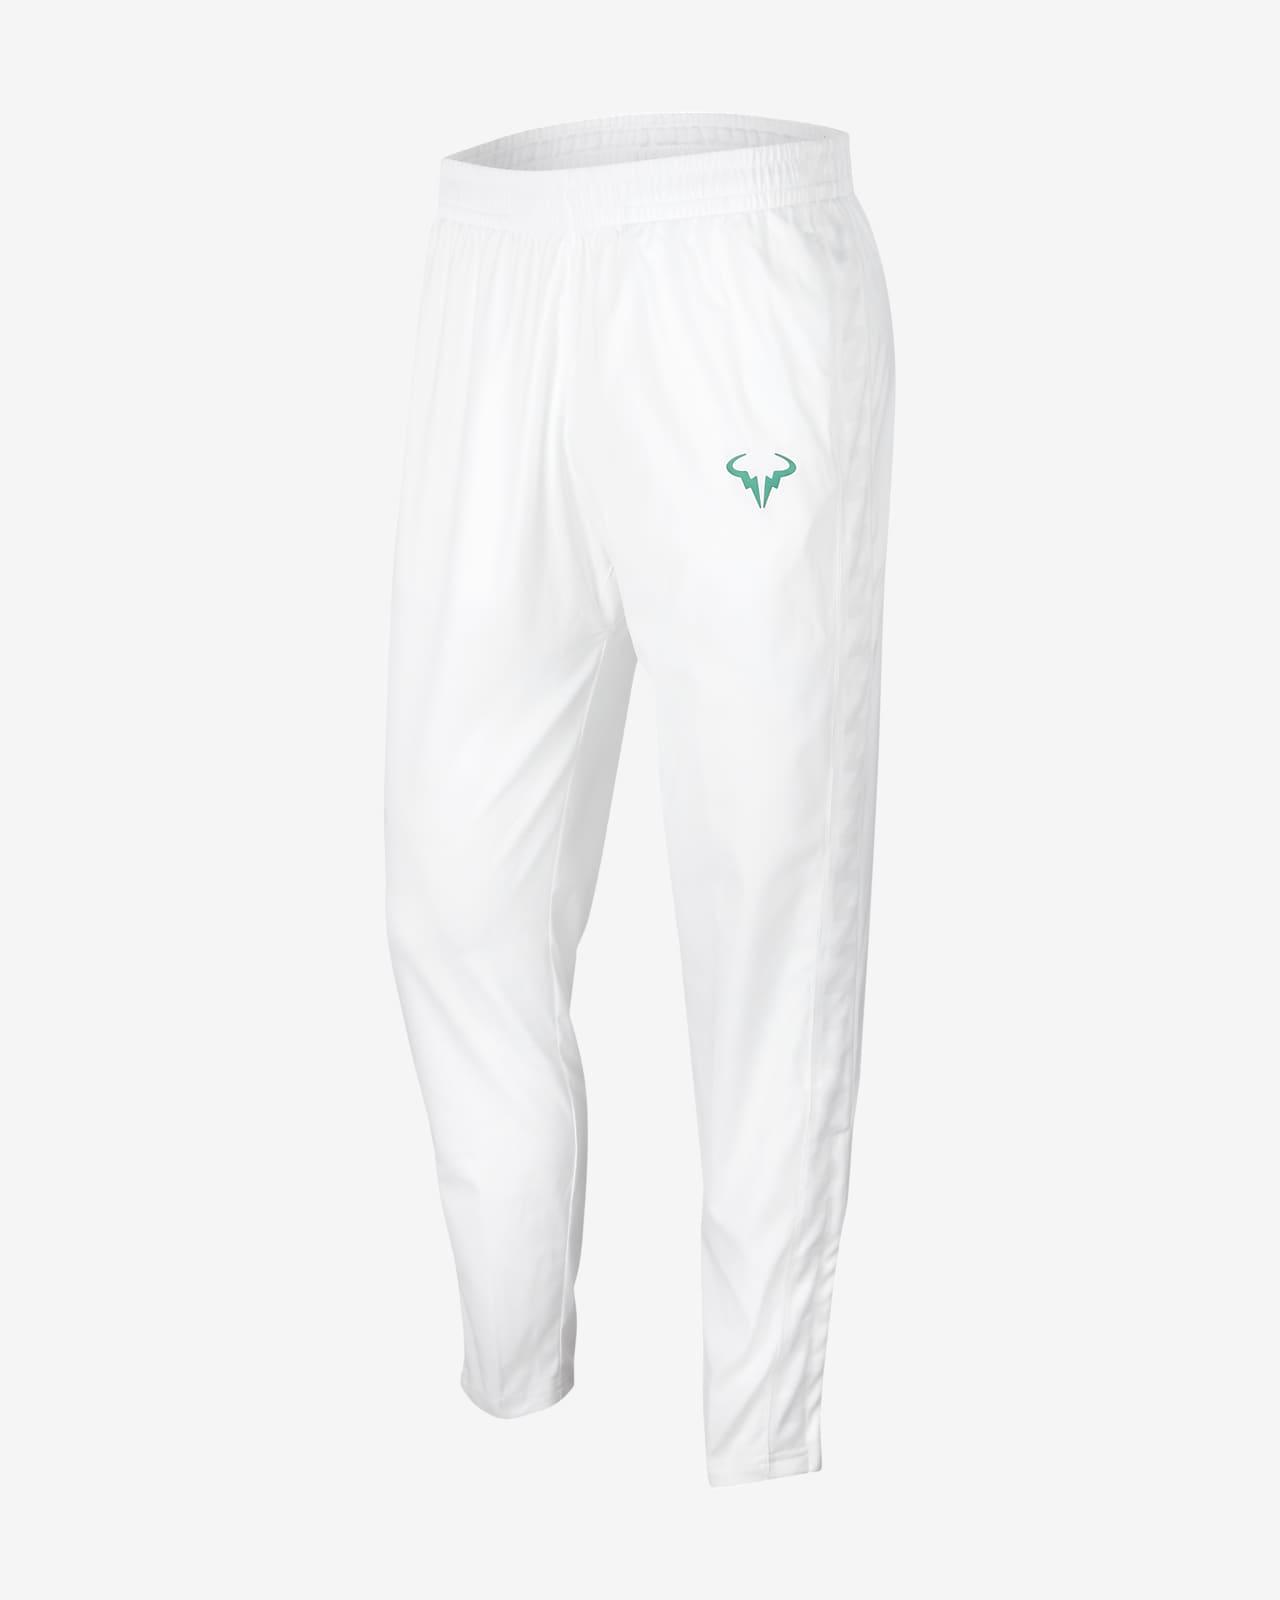 Pantalones de tenis para hombre Rafa